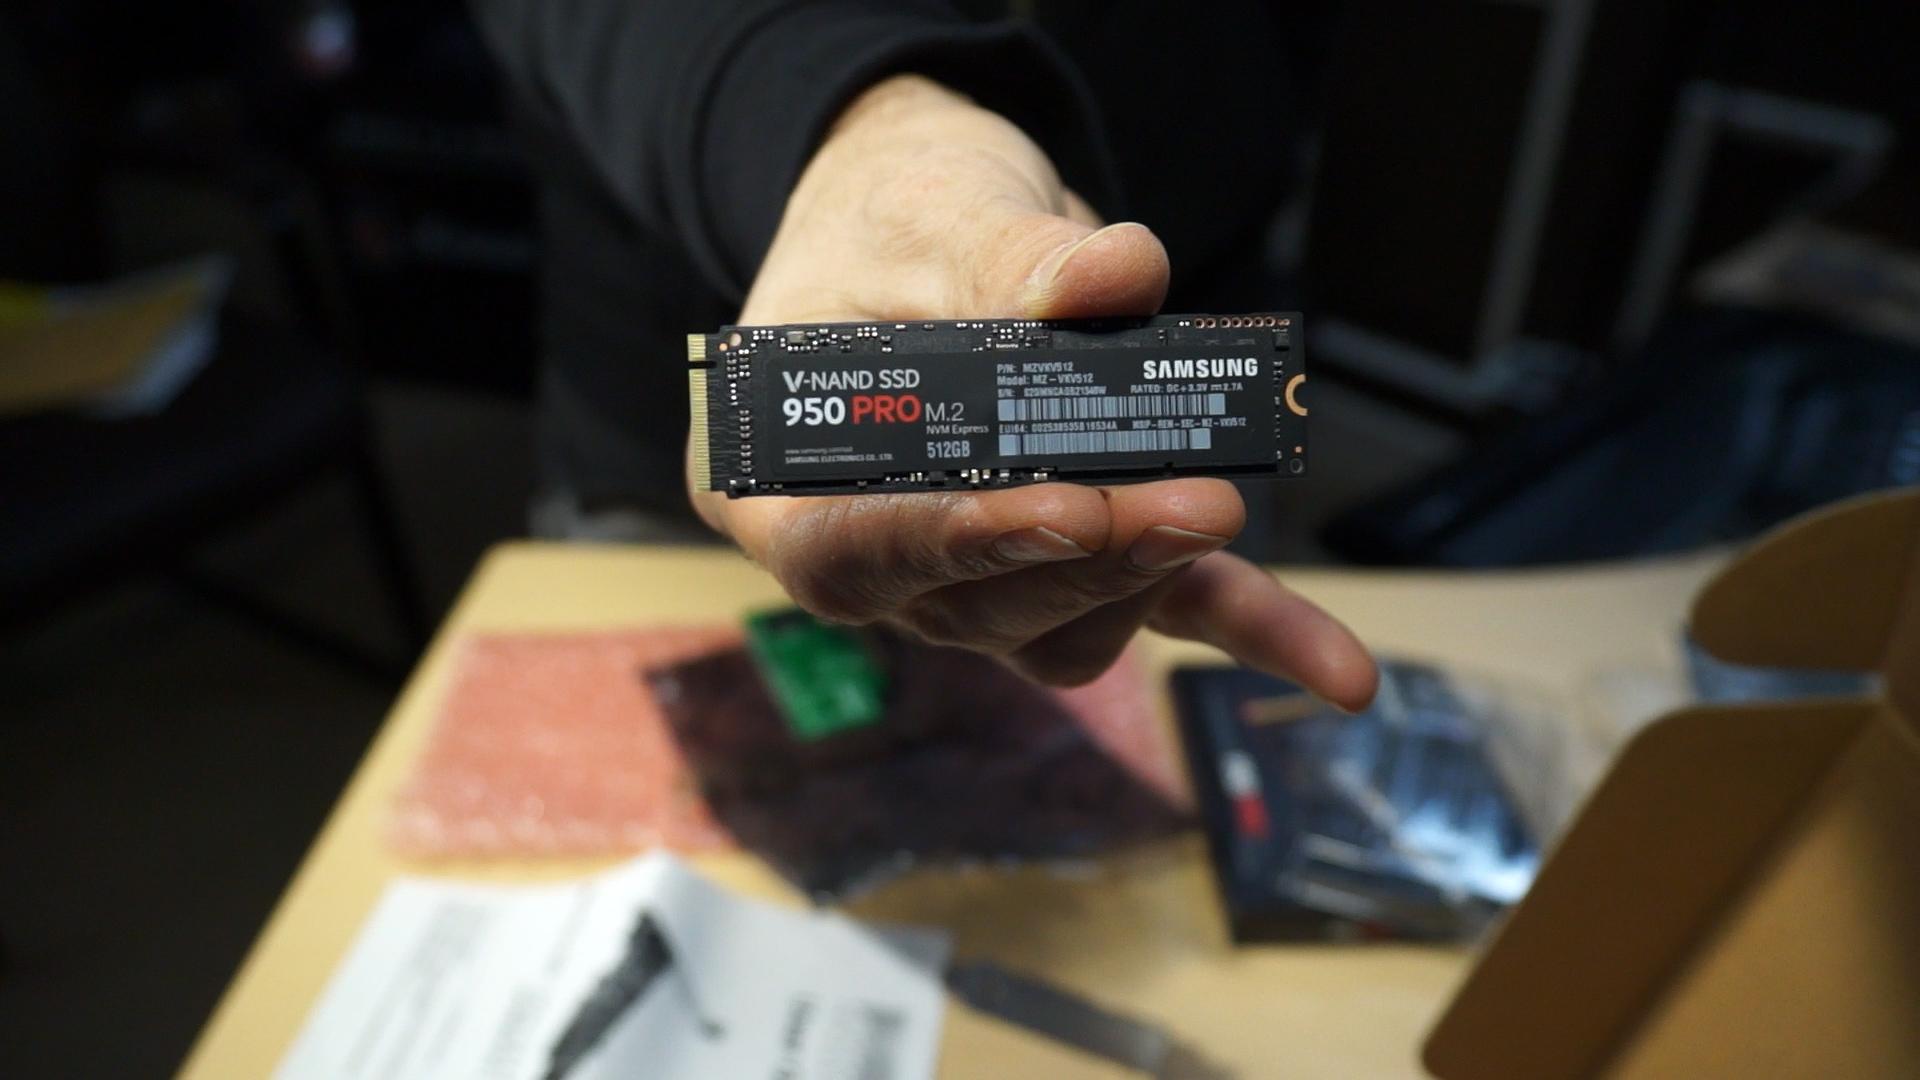 Samsung 950 Pro M.2 Drive